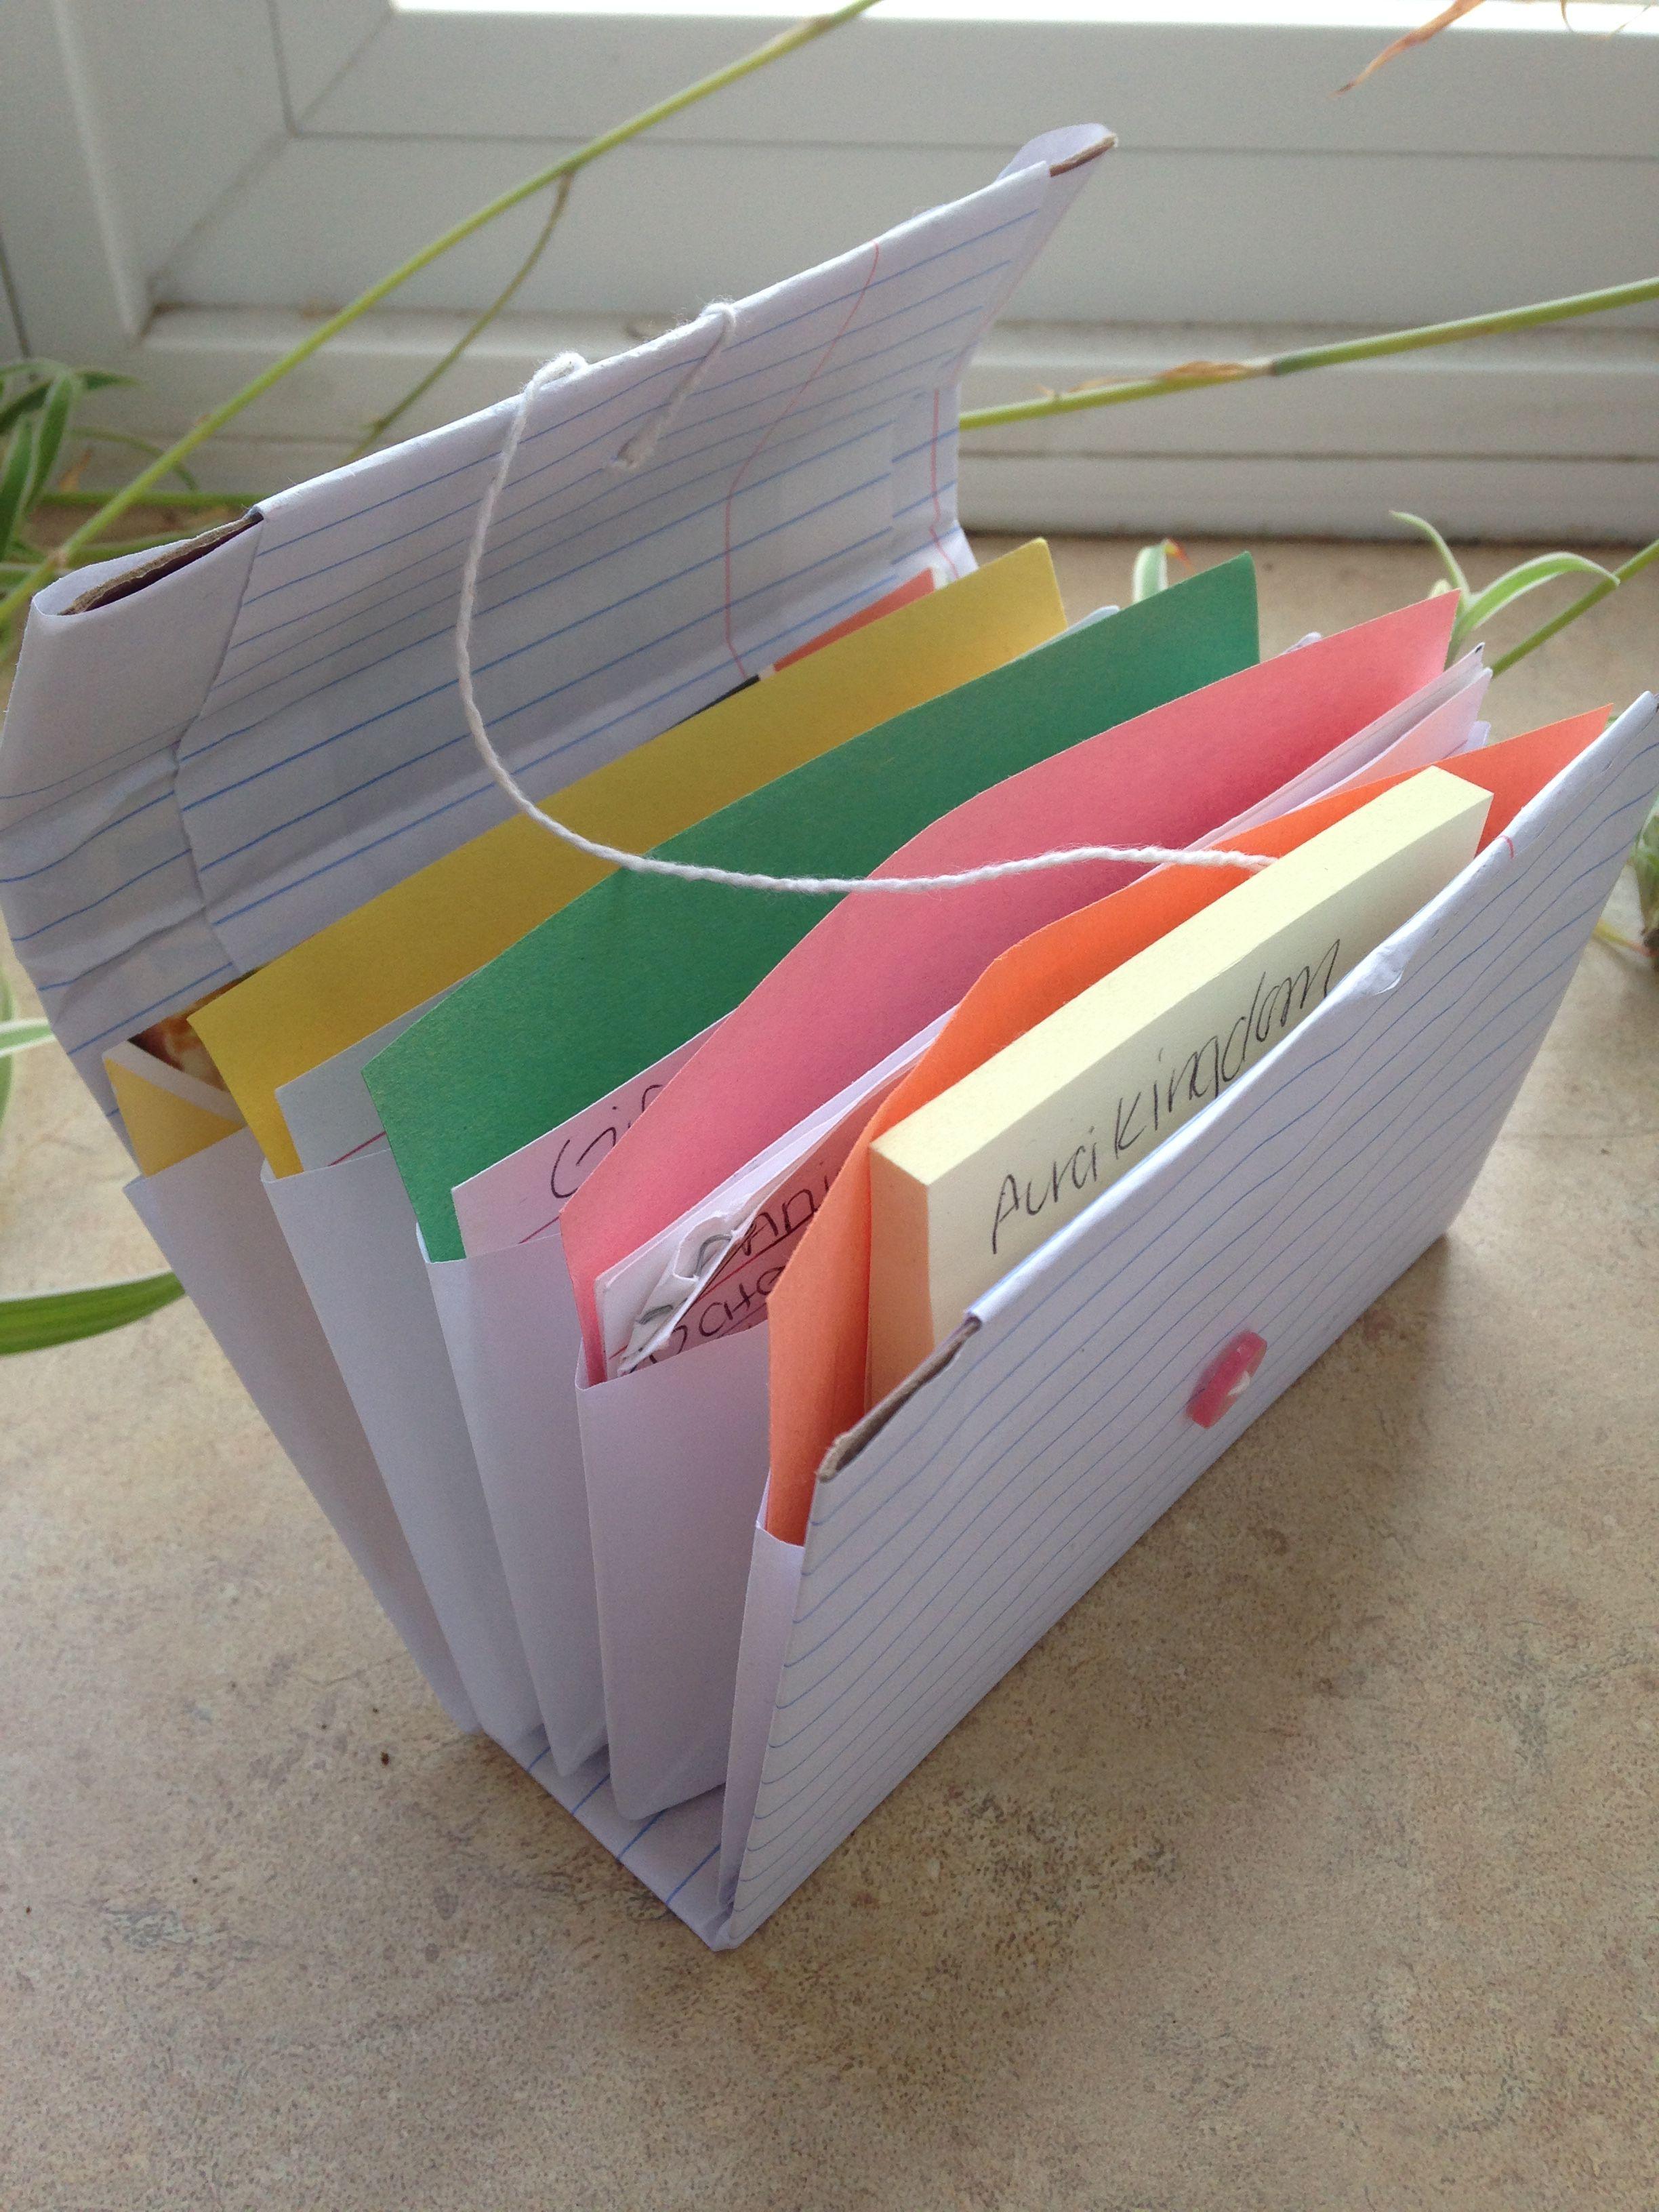 Diy Expandable Index Card Holder Using Cardboard Diy Index Cards Card Holder Diy Diy Note Cards